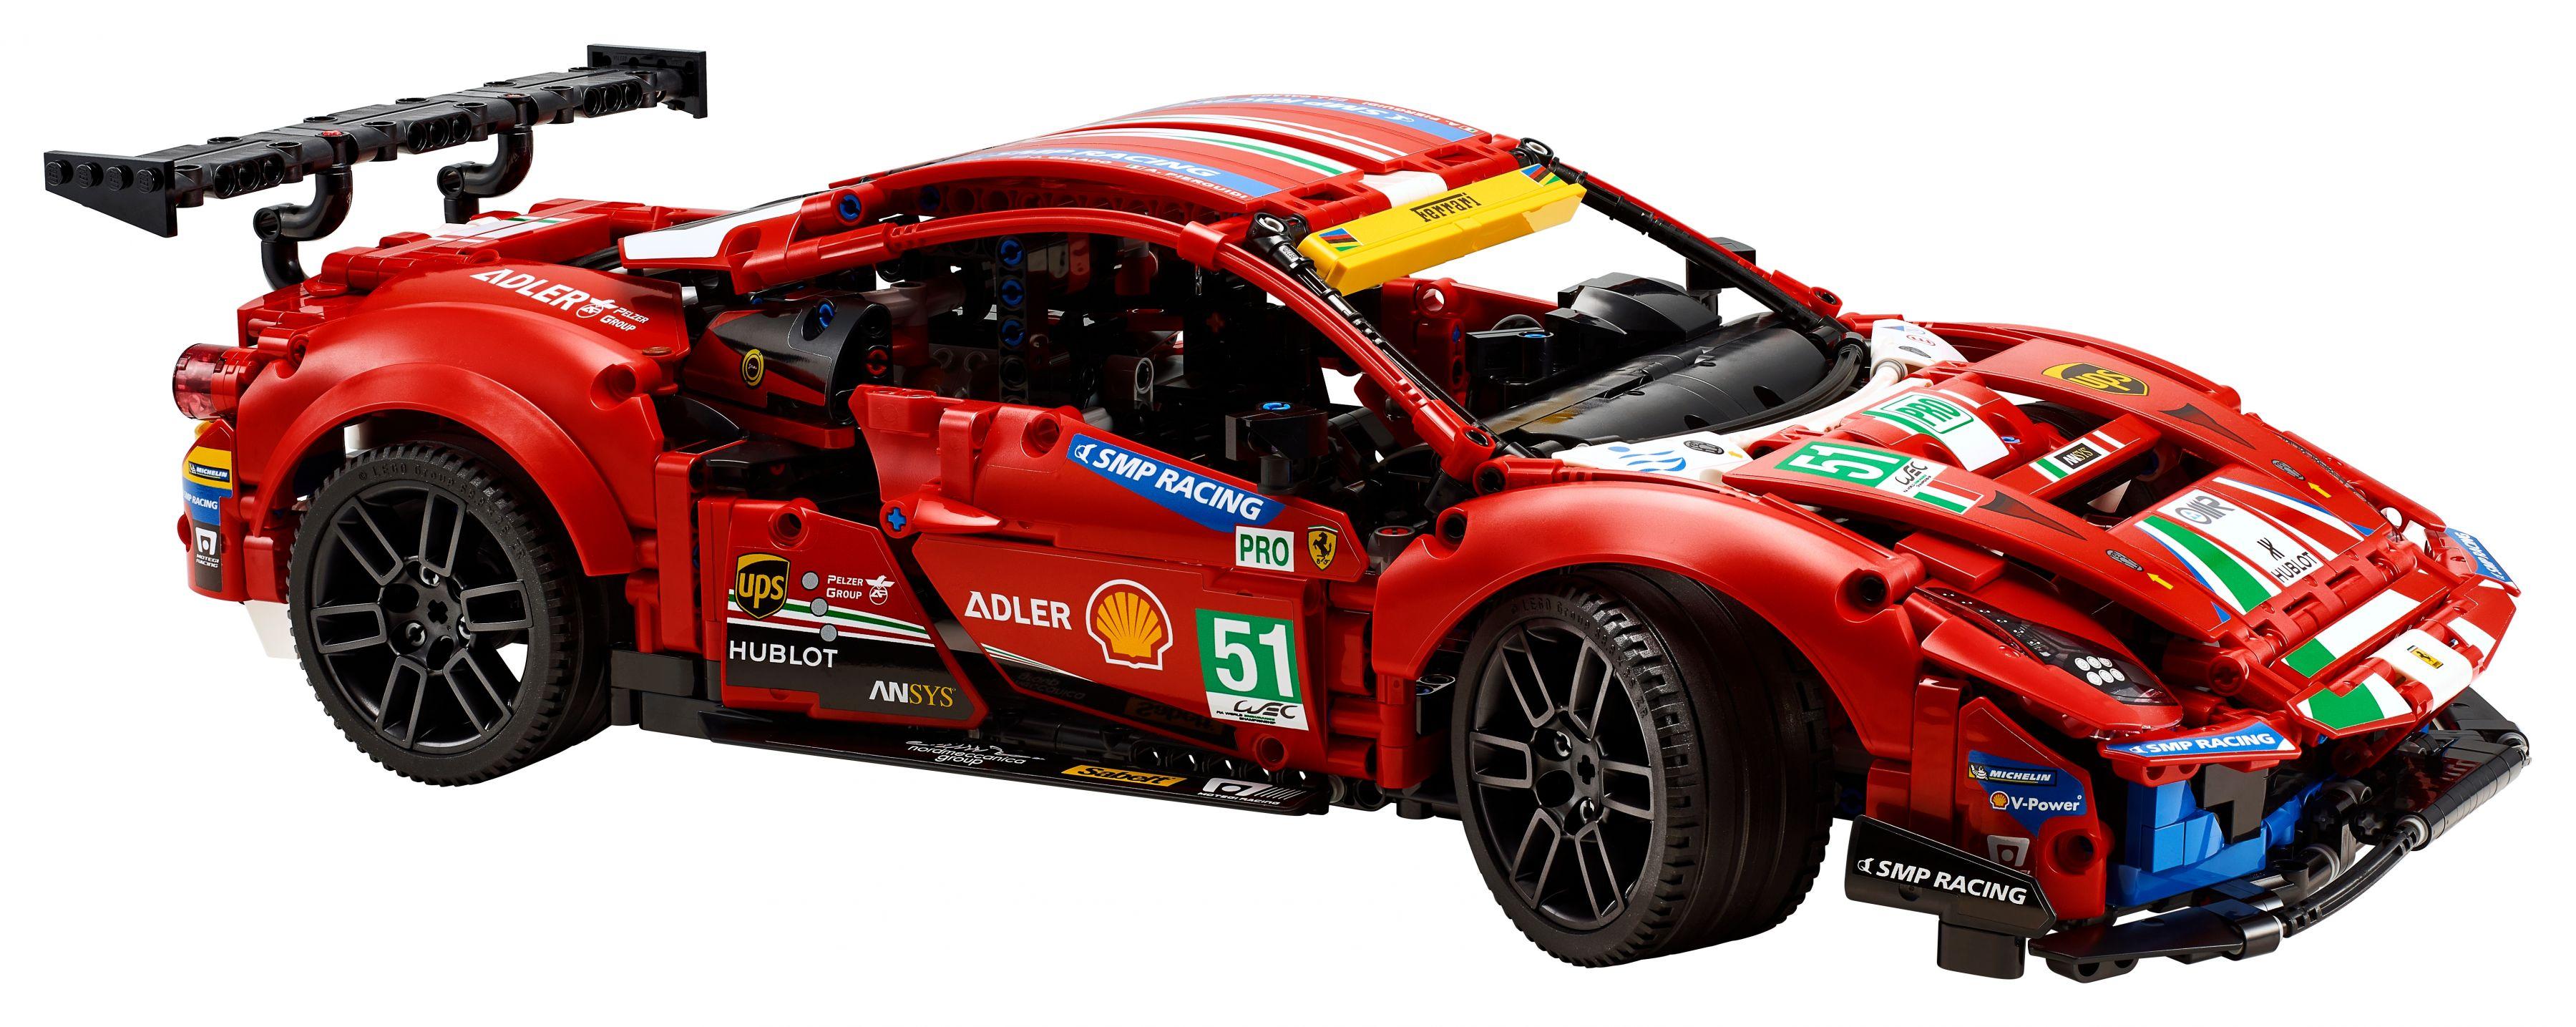 Lego Technic Ferrari 488 Gte 42125 2021 Ab 132 87 26 Gespart Stand 01 04 2021 Lego Preisvergleich Brickmerge De